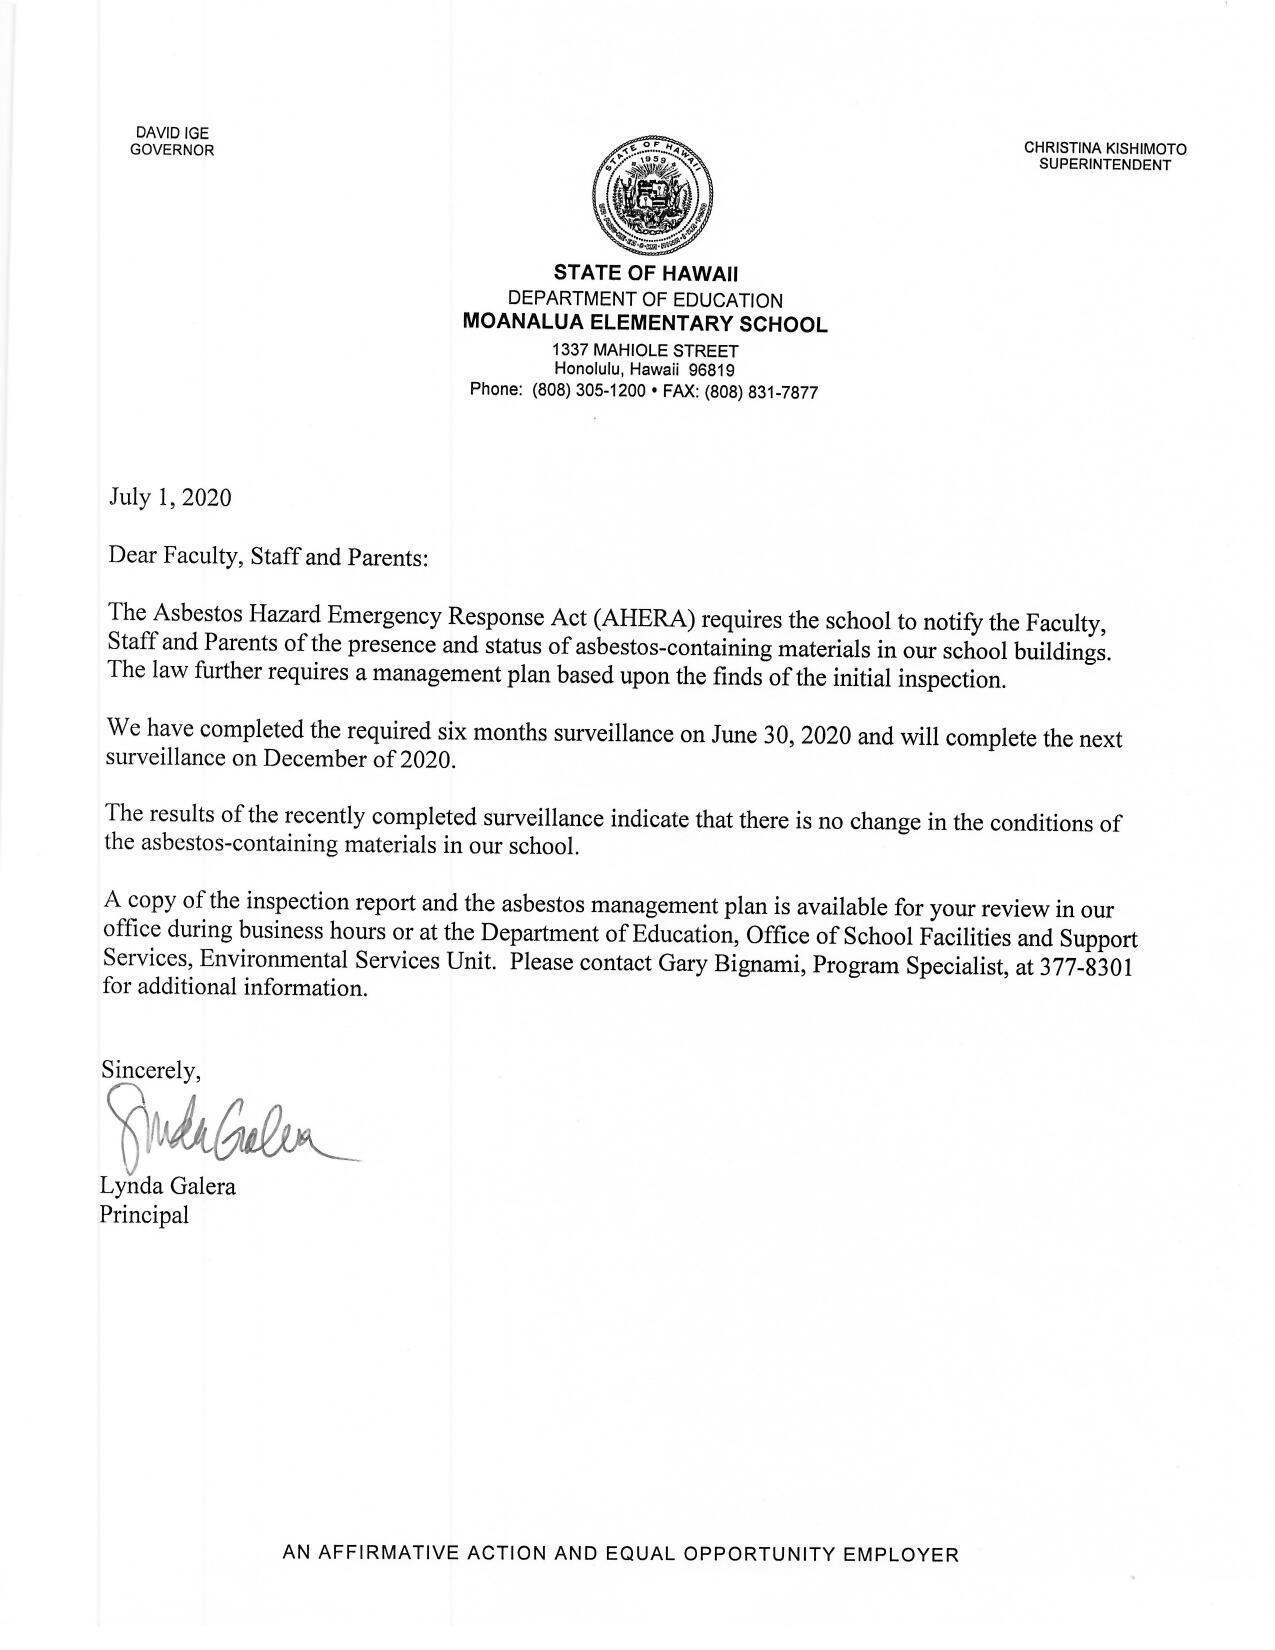 Asbestos Hazard Emergency Response Act memo